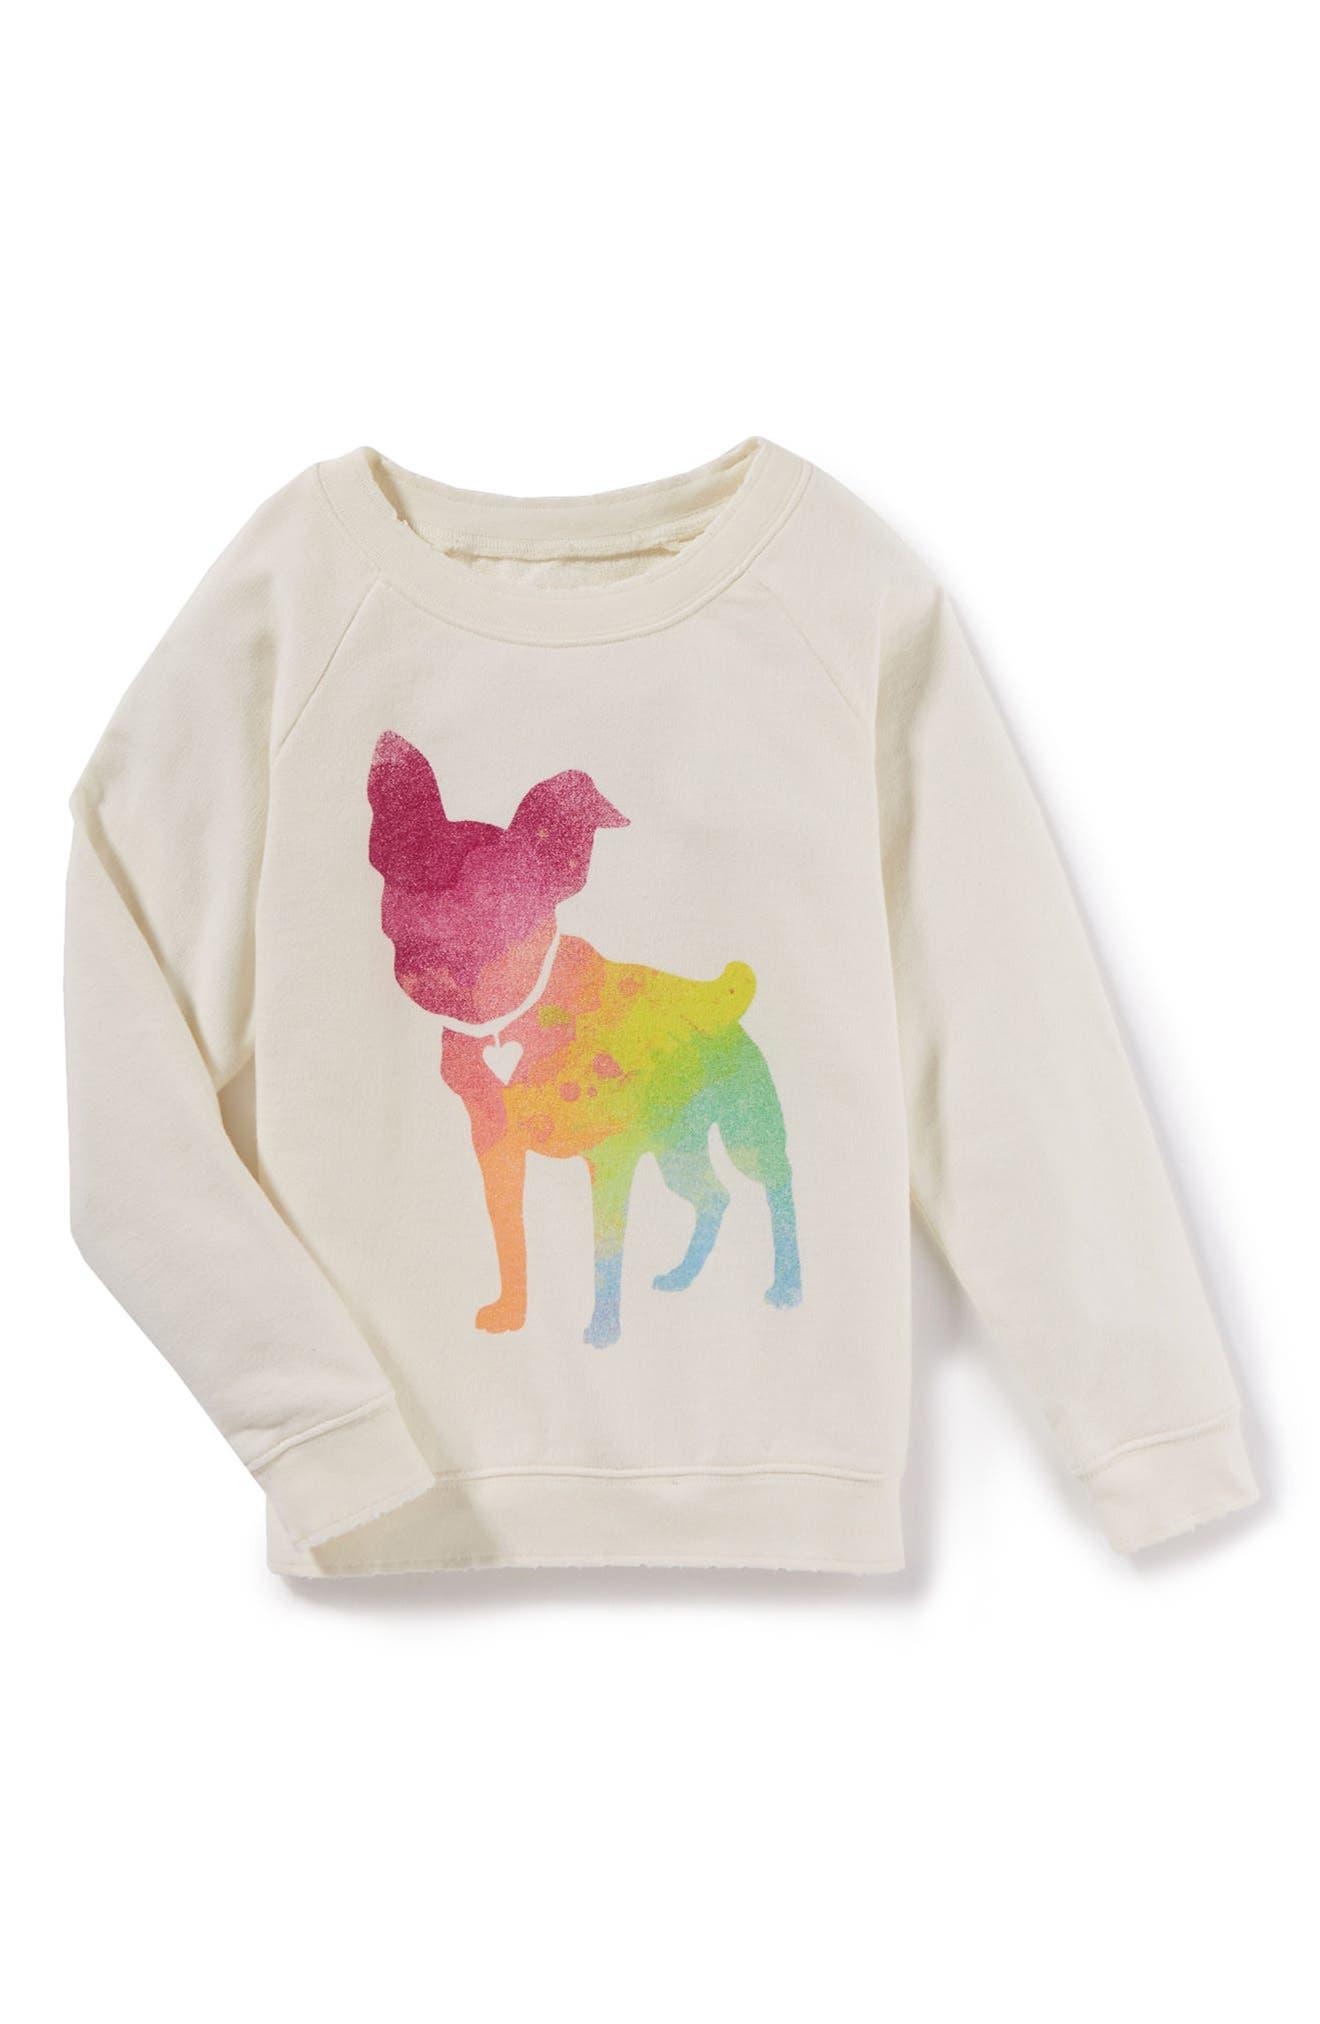 Alternate Image 1 Selected - Peek Colette Graphic Sweatshirt (Baby Girls)